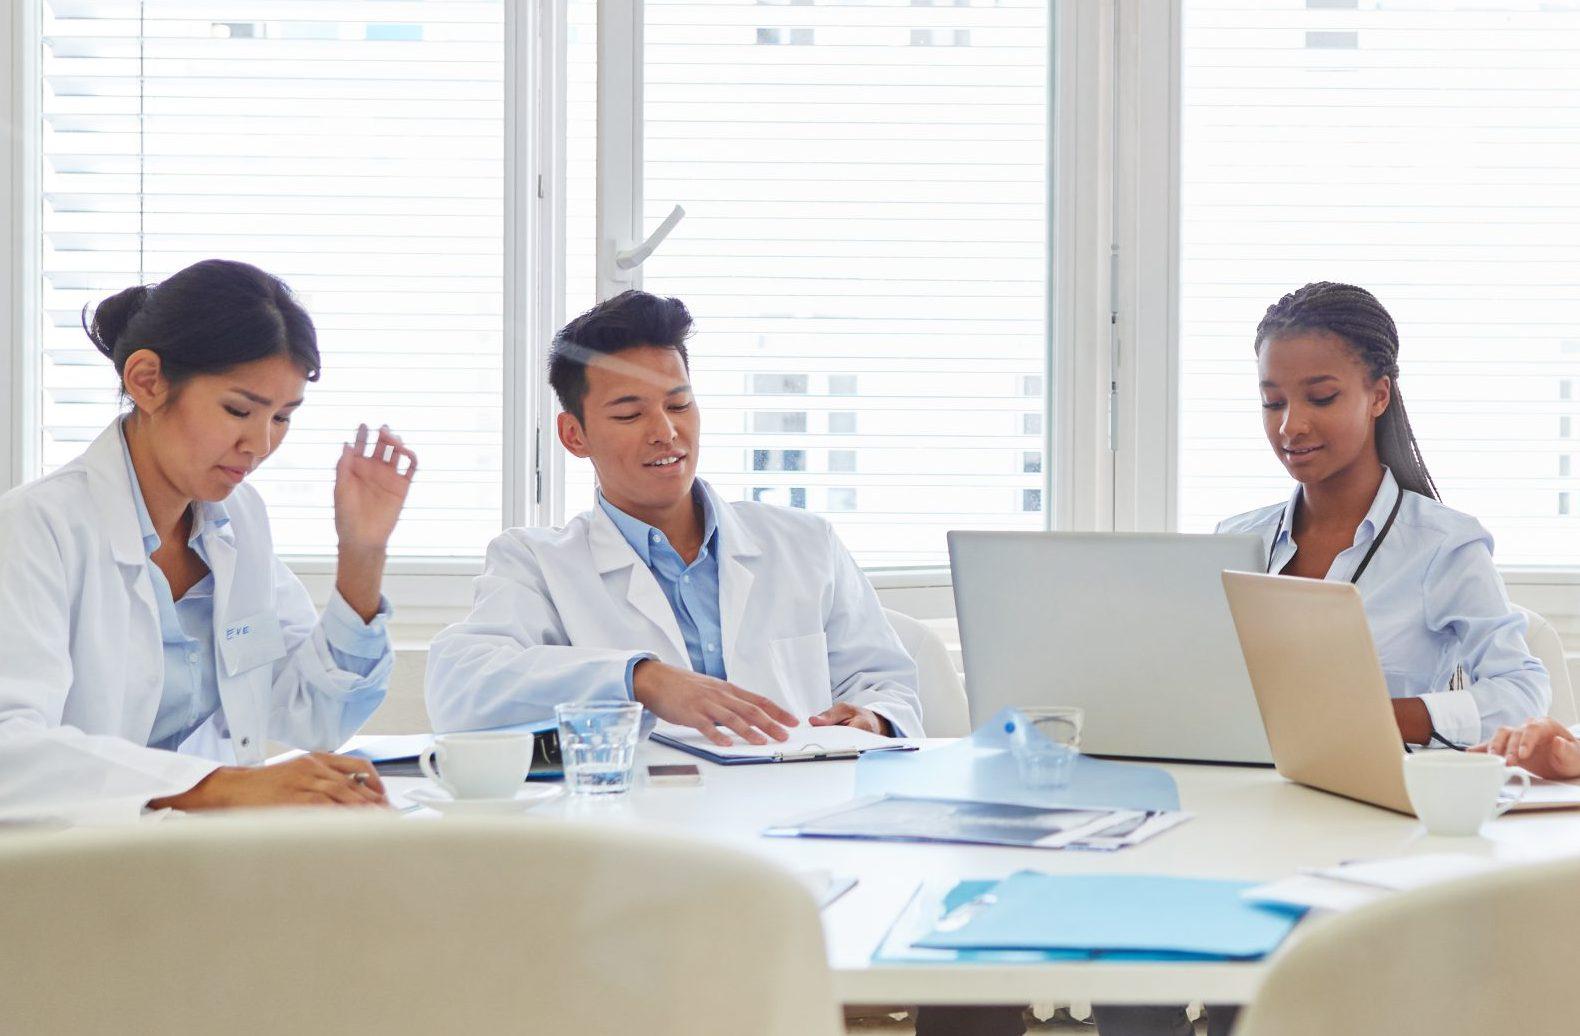 Medical team training